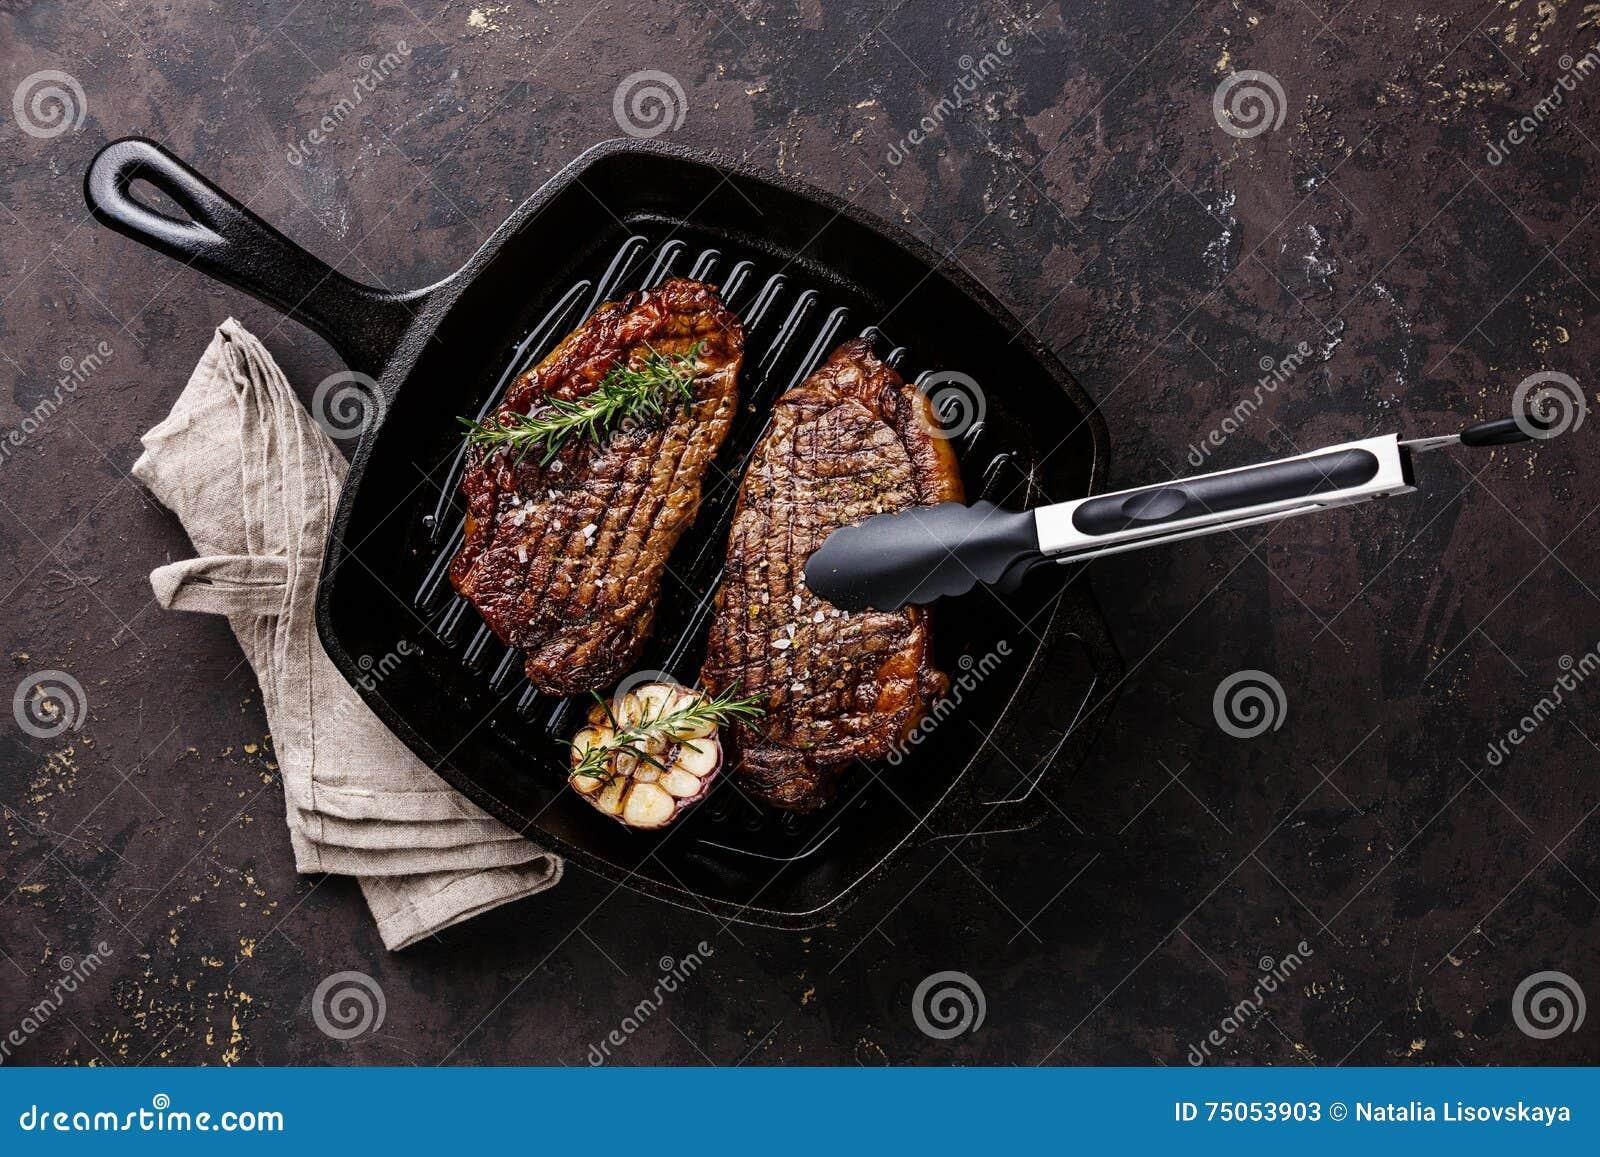 how to cook rib eye steak in a frying pan